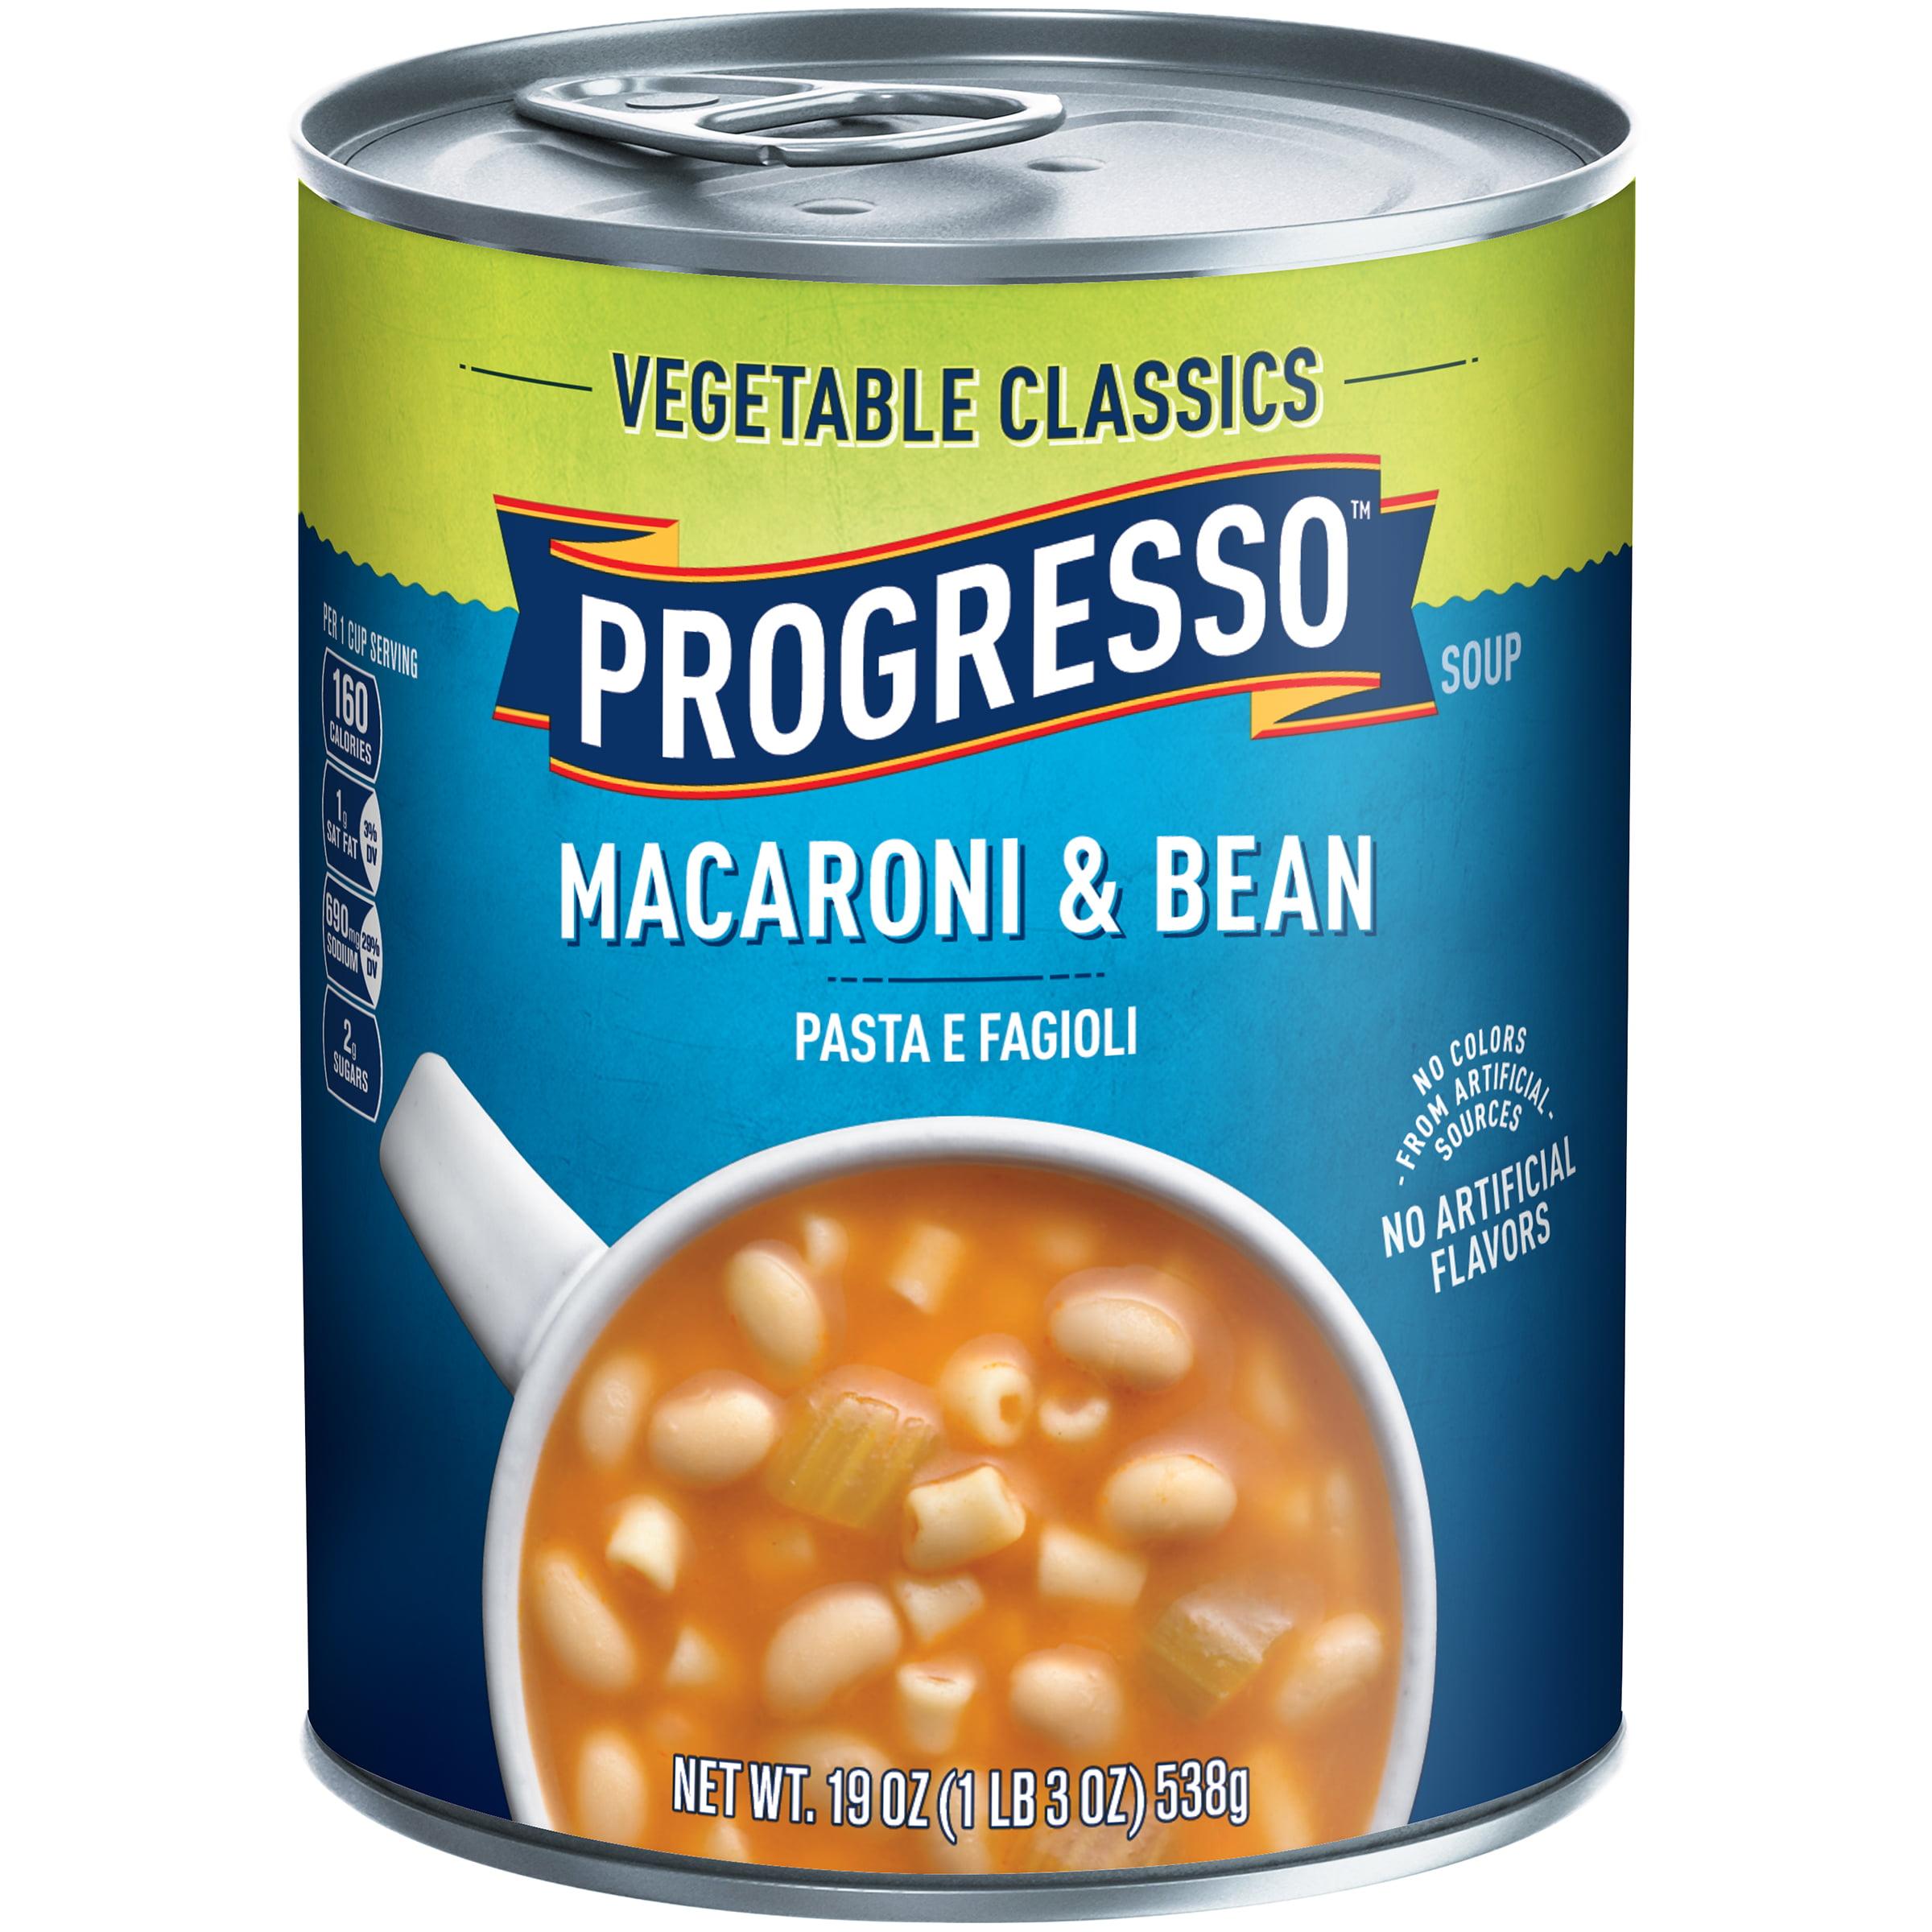 Progresso Vegetable Classics Garden Vegetable Soup, 18.5 oz ...